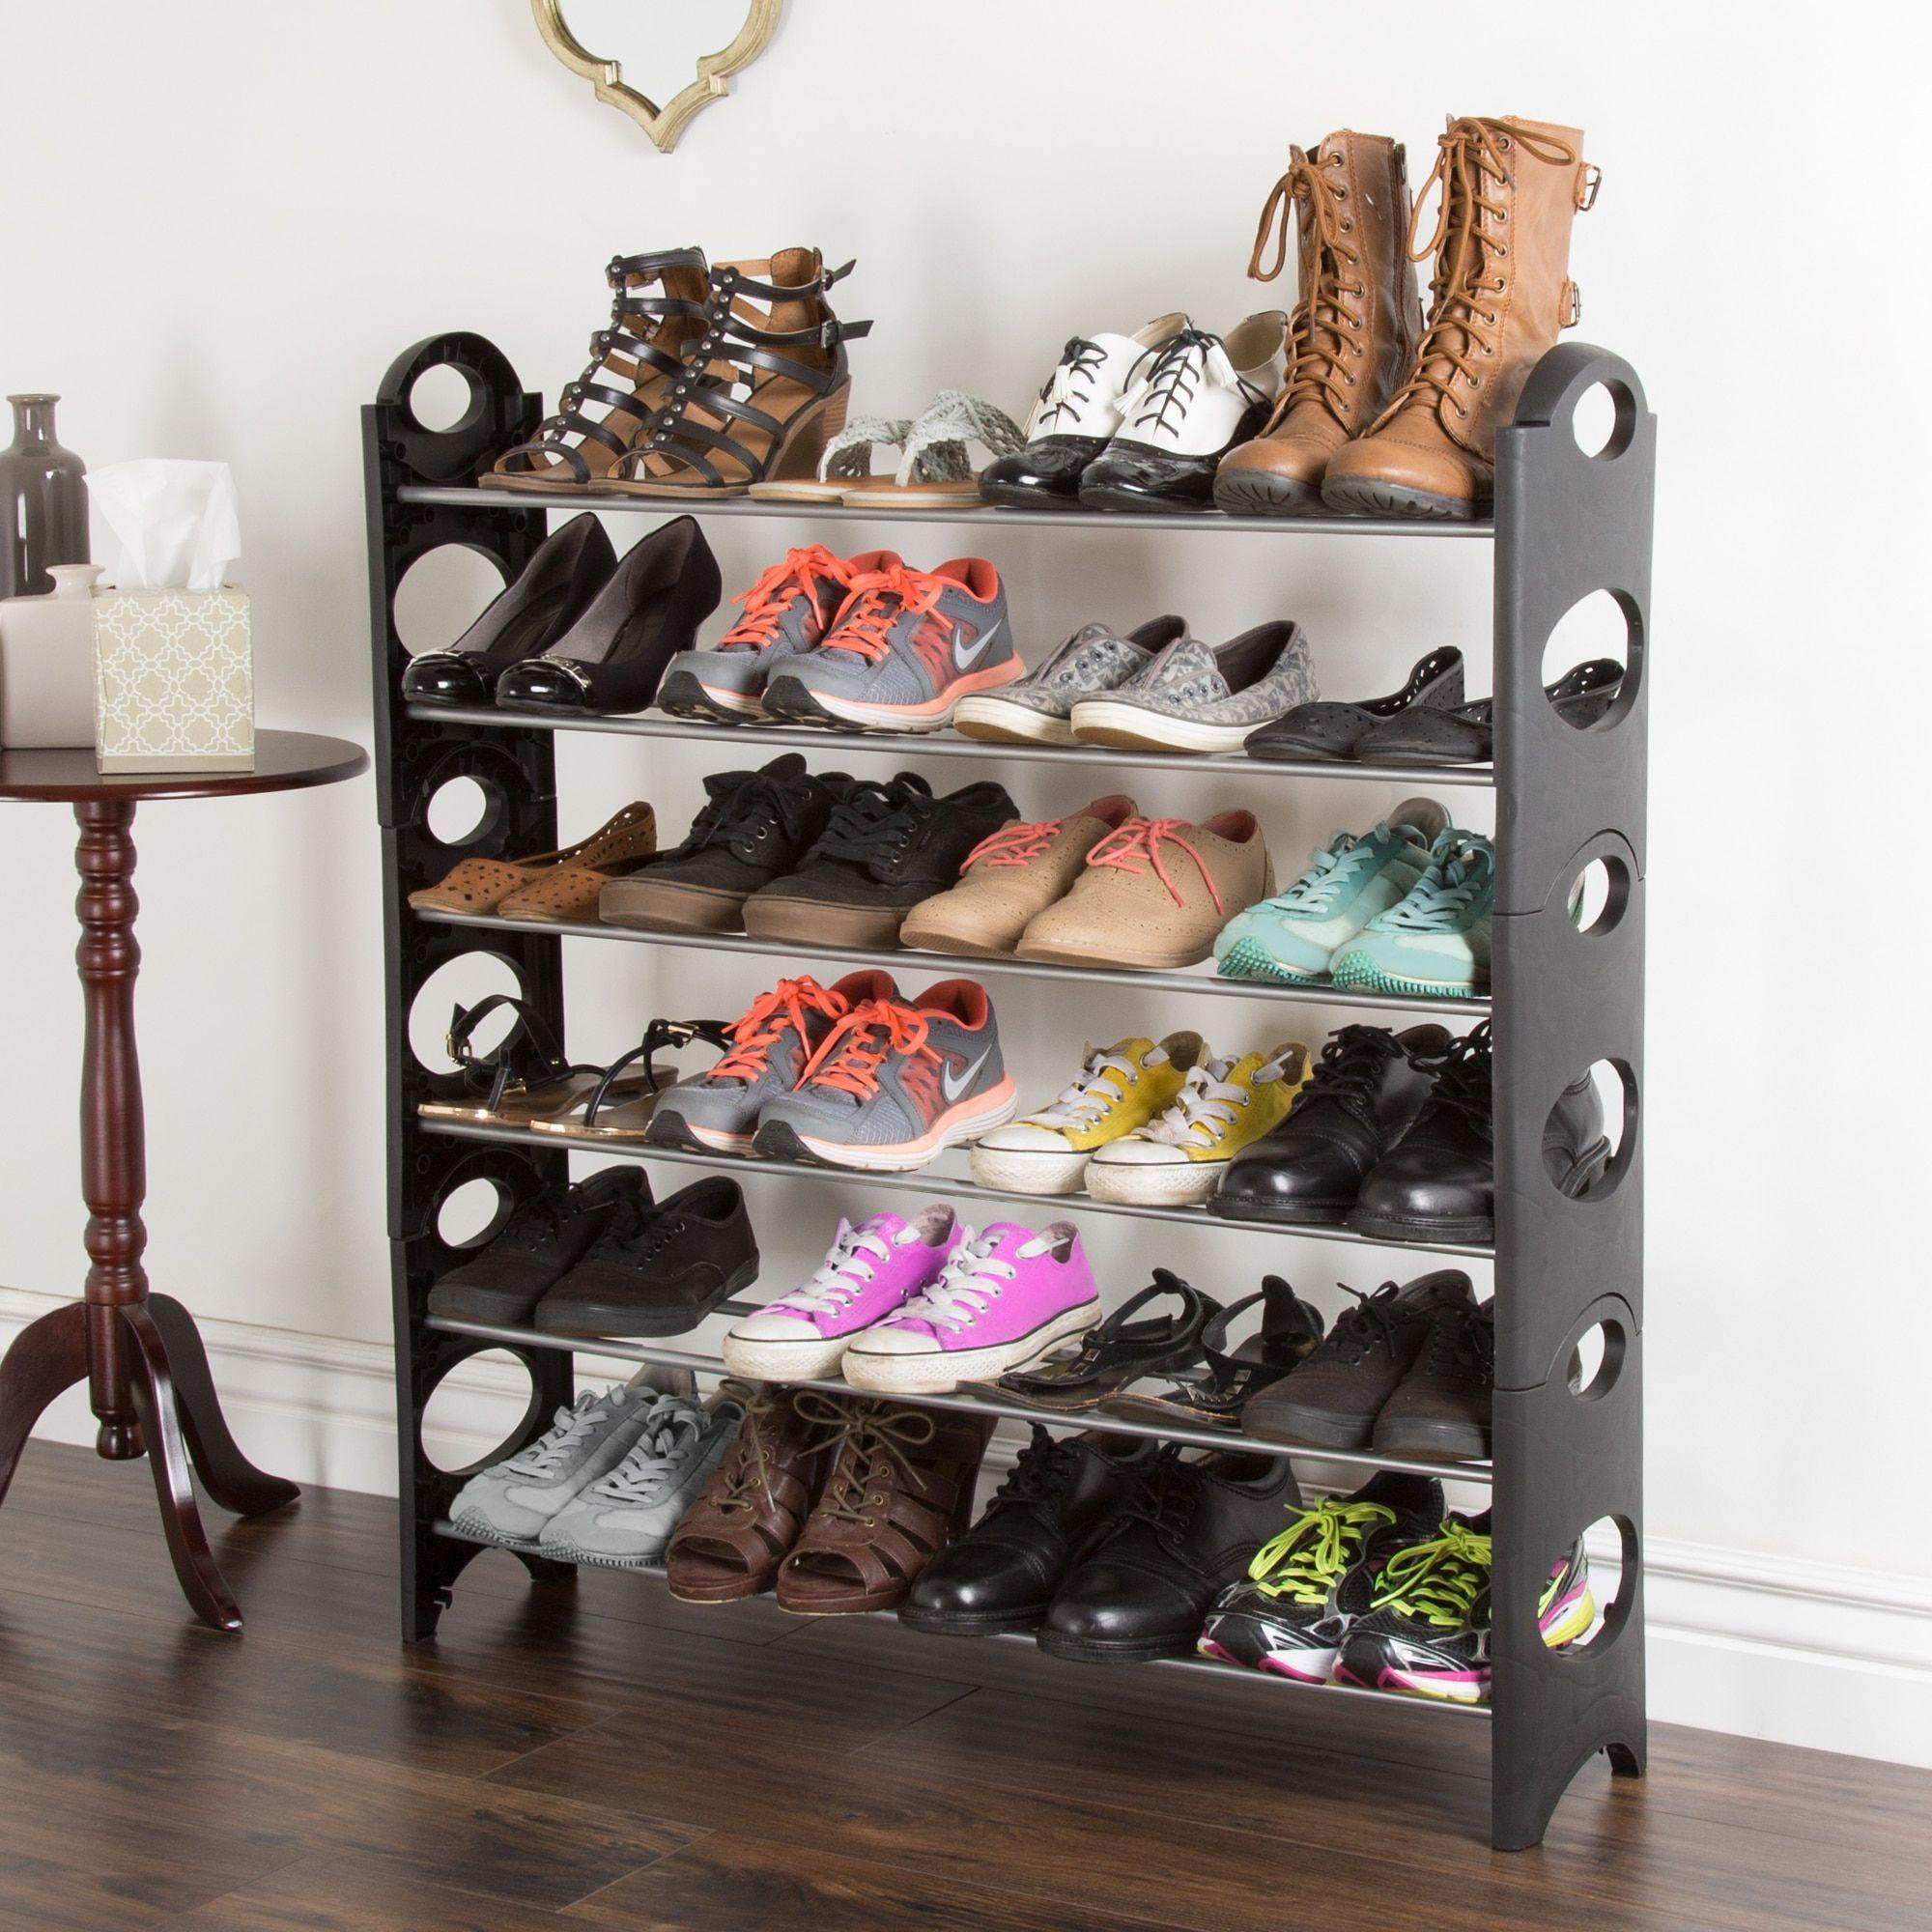 Everyday Home 6 Tier Stackable Shoe Rack 24 Pair Capacity Black